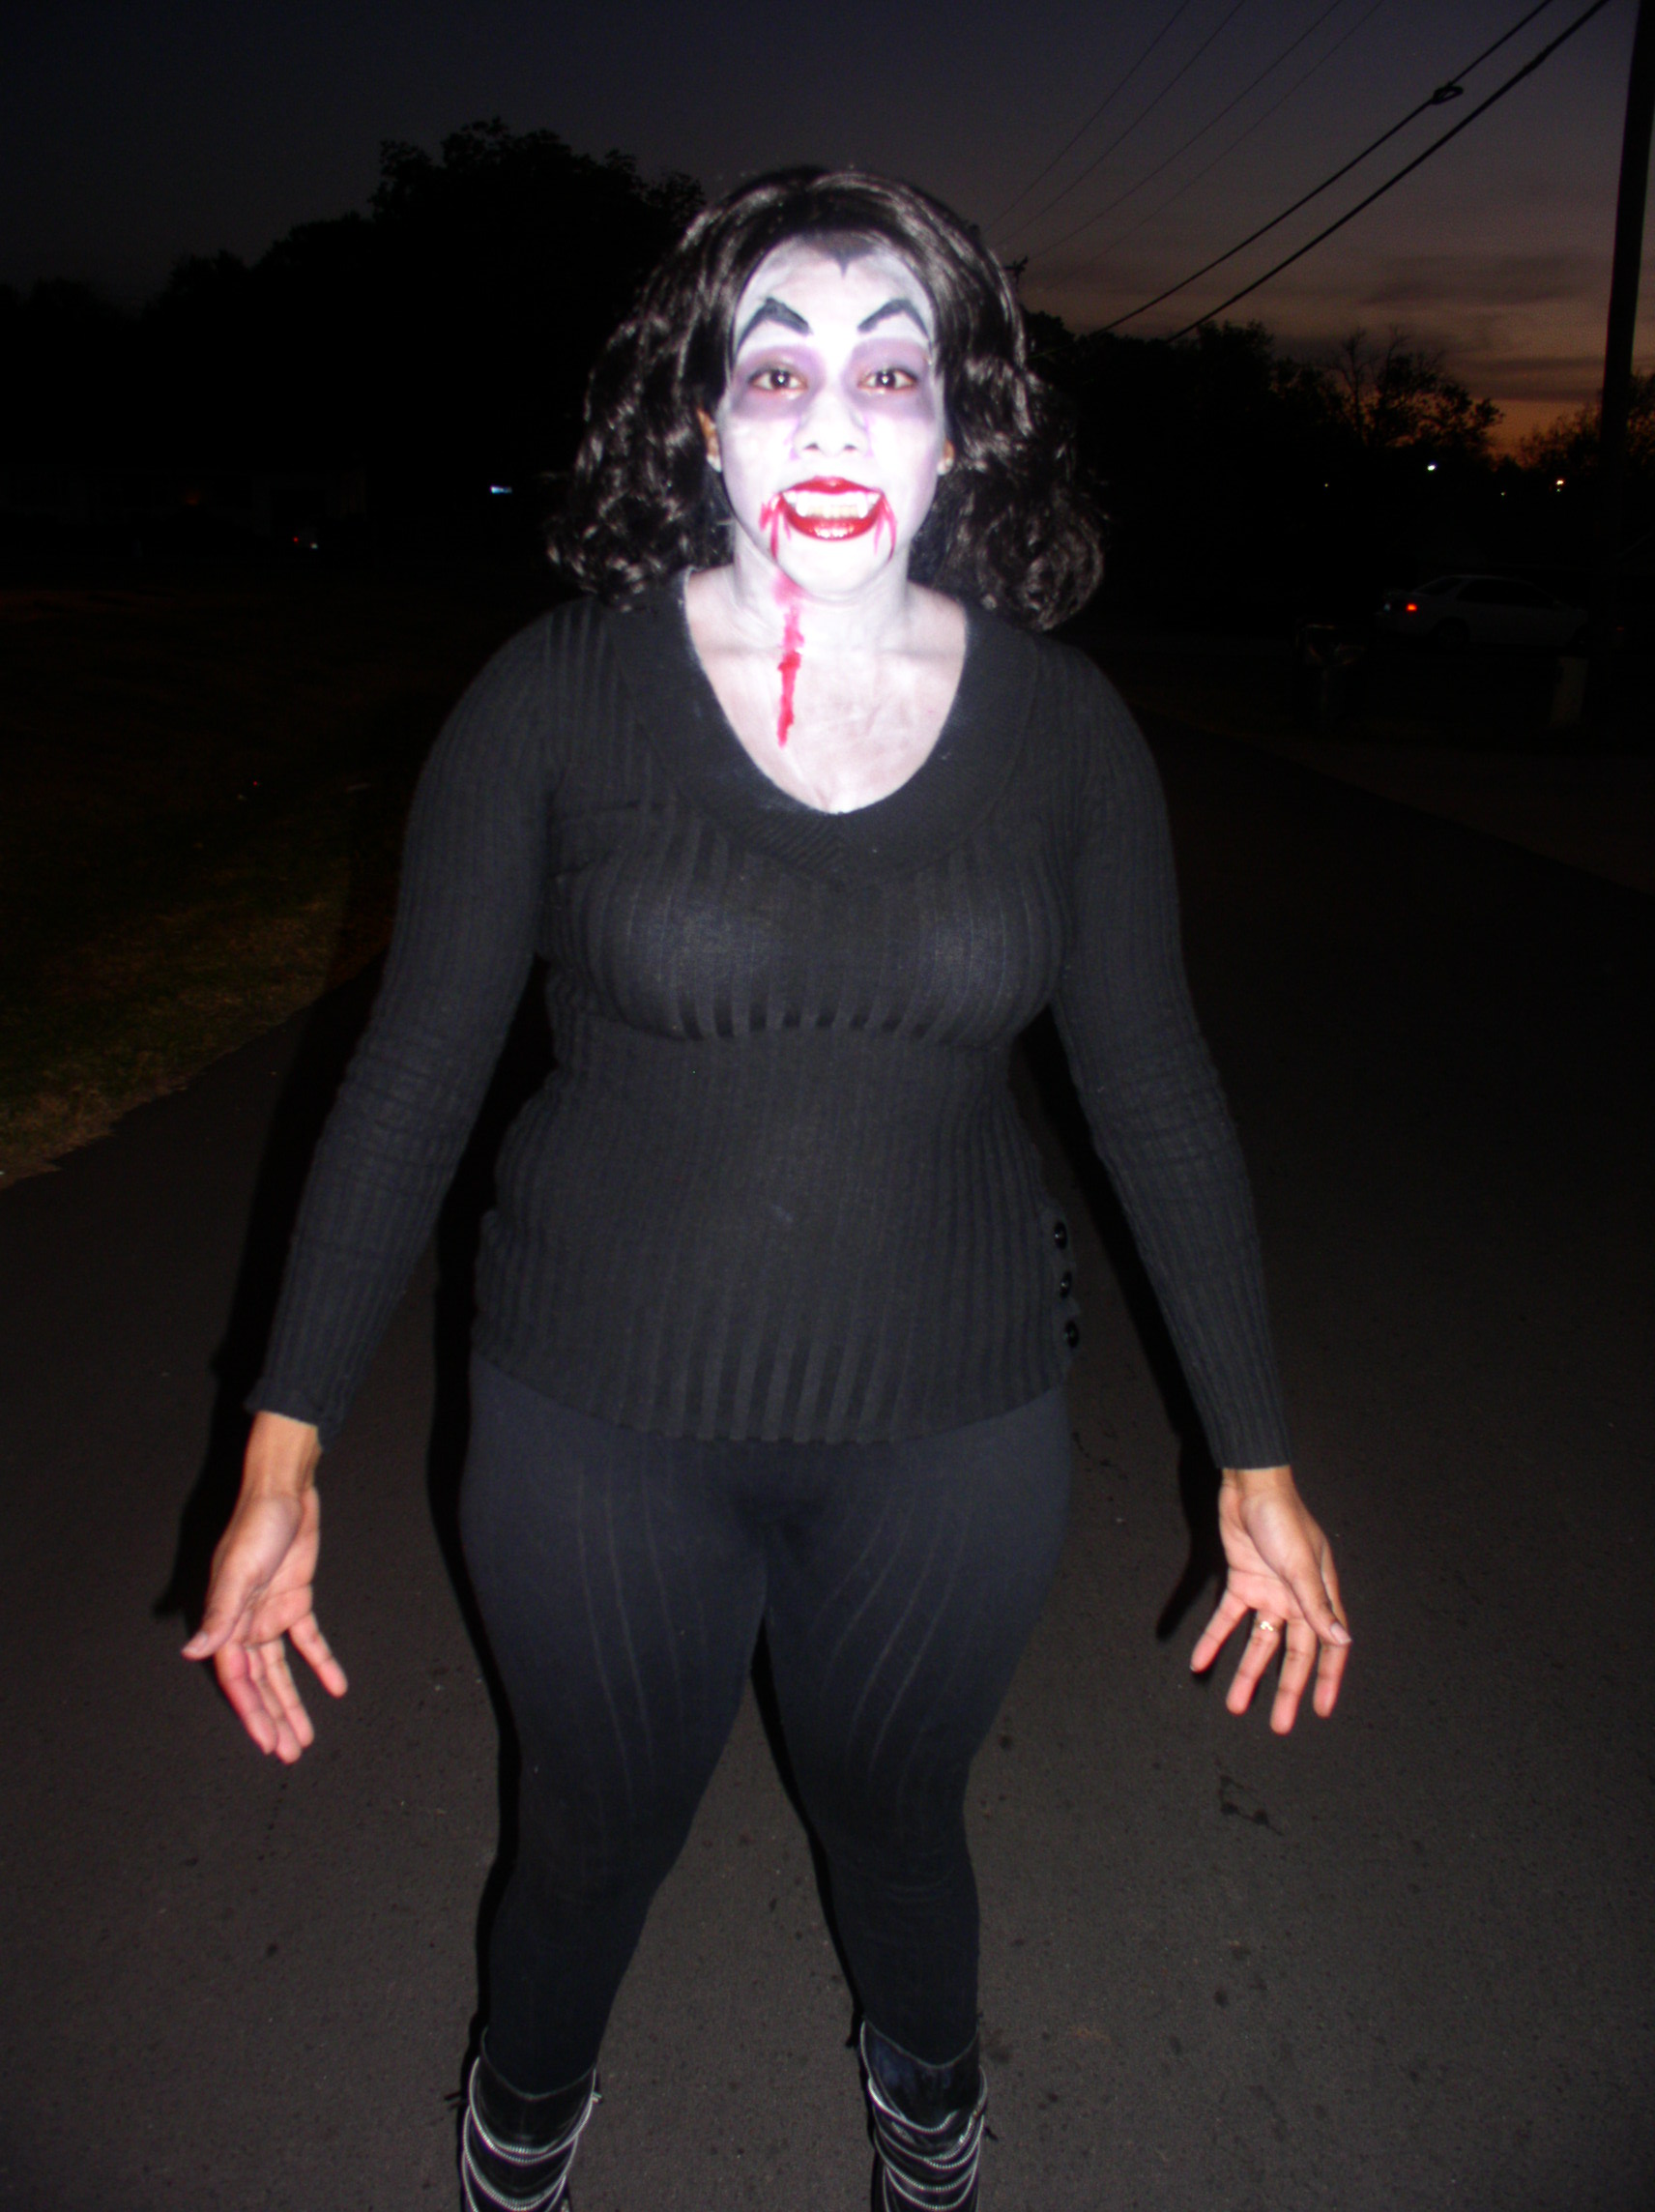 My daughter the vamp